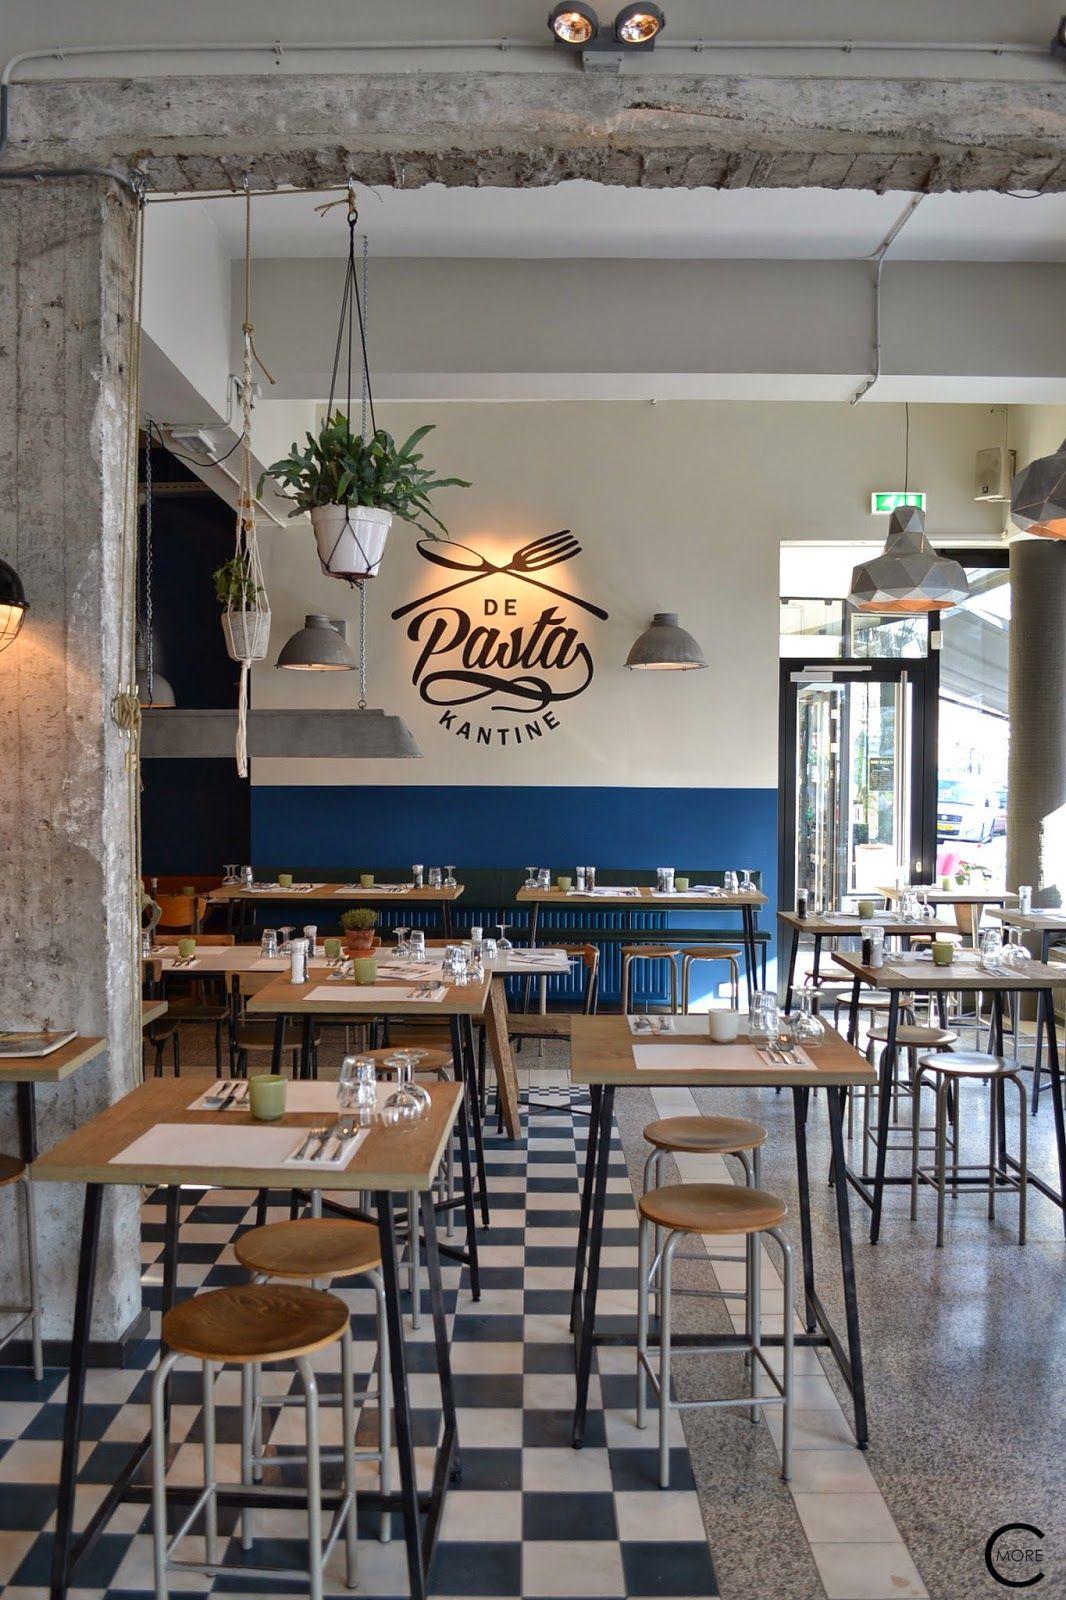 De Pasta Kantine   The Pasta Canteen   Rotterdam restaurant C-More ...